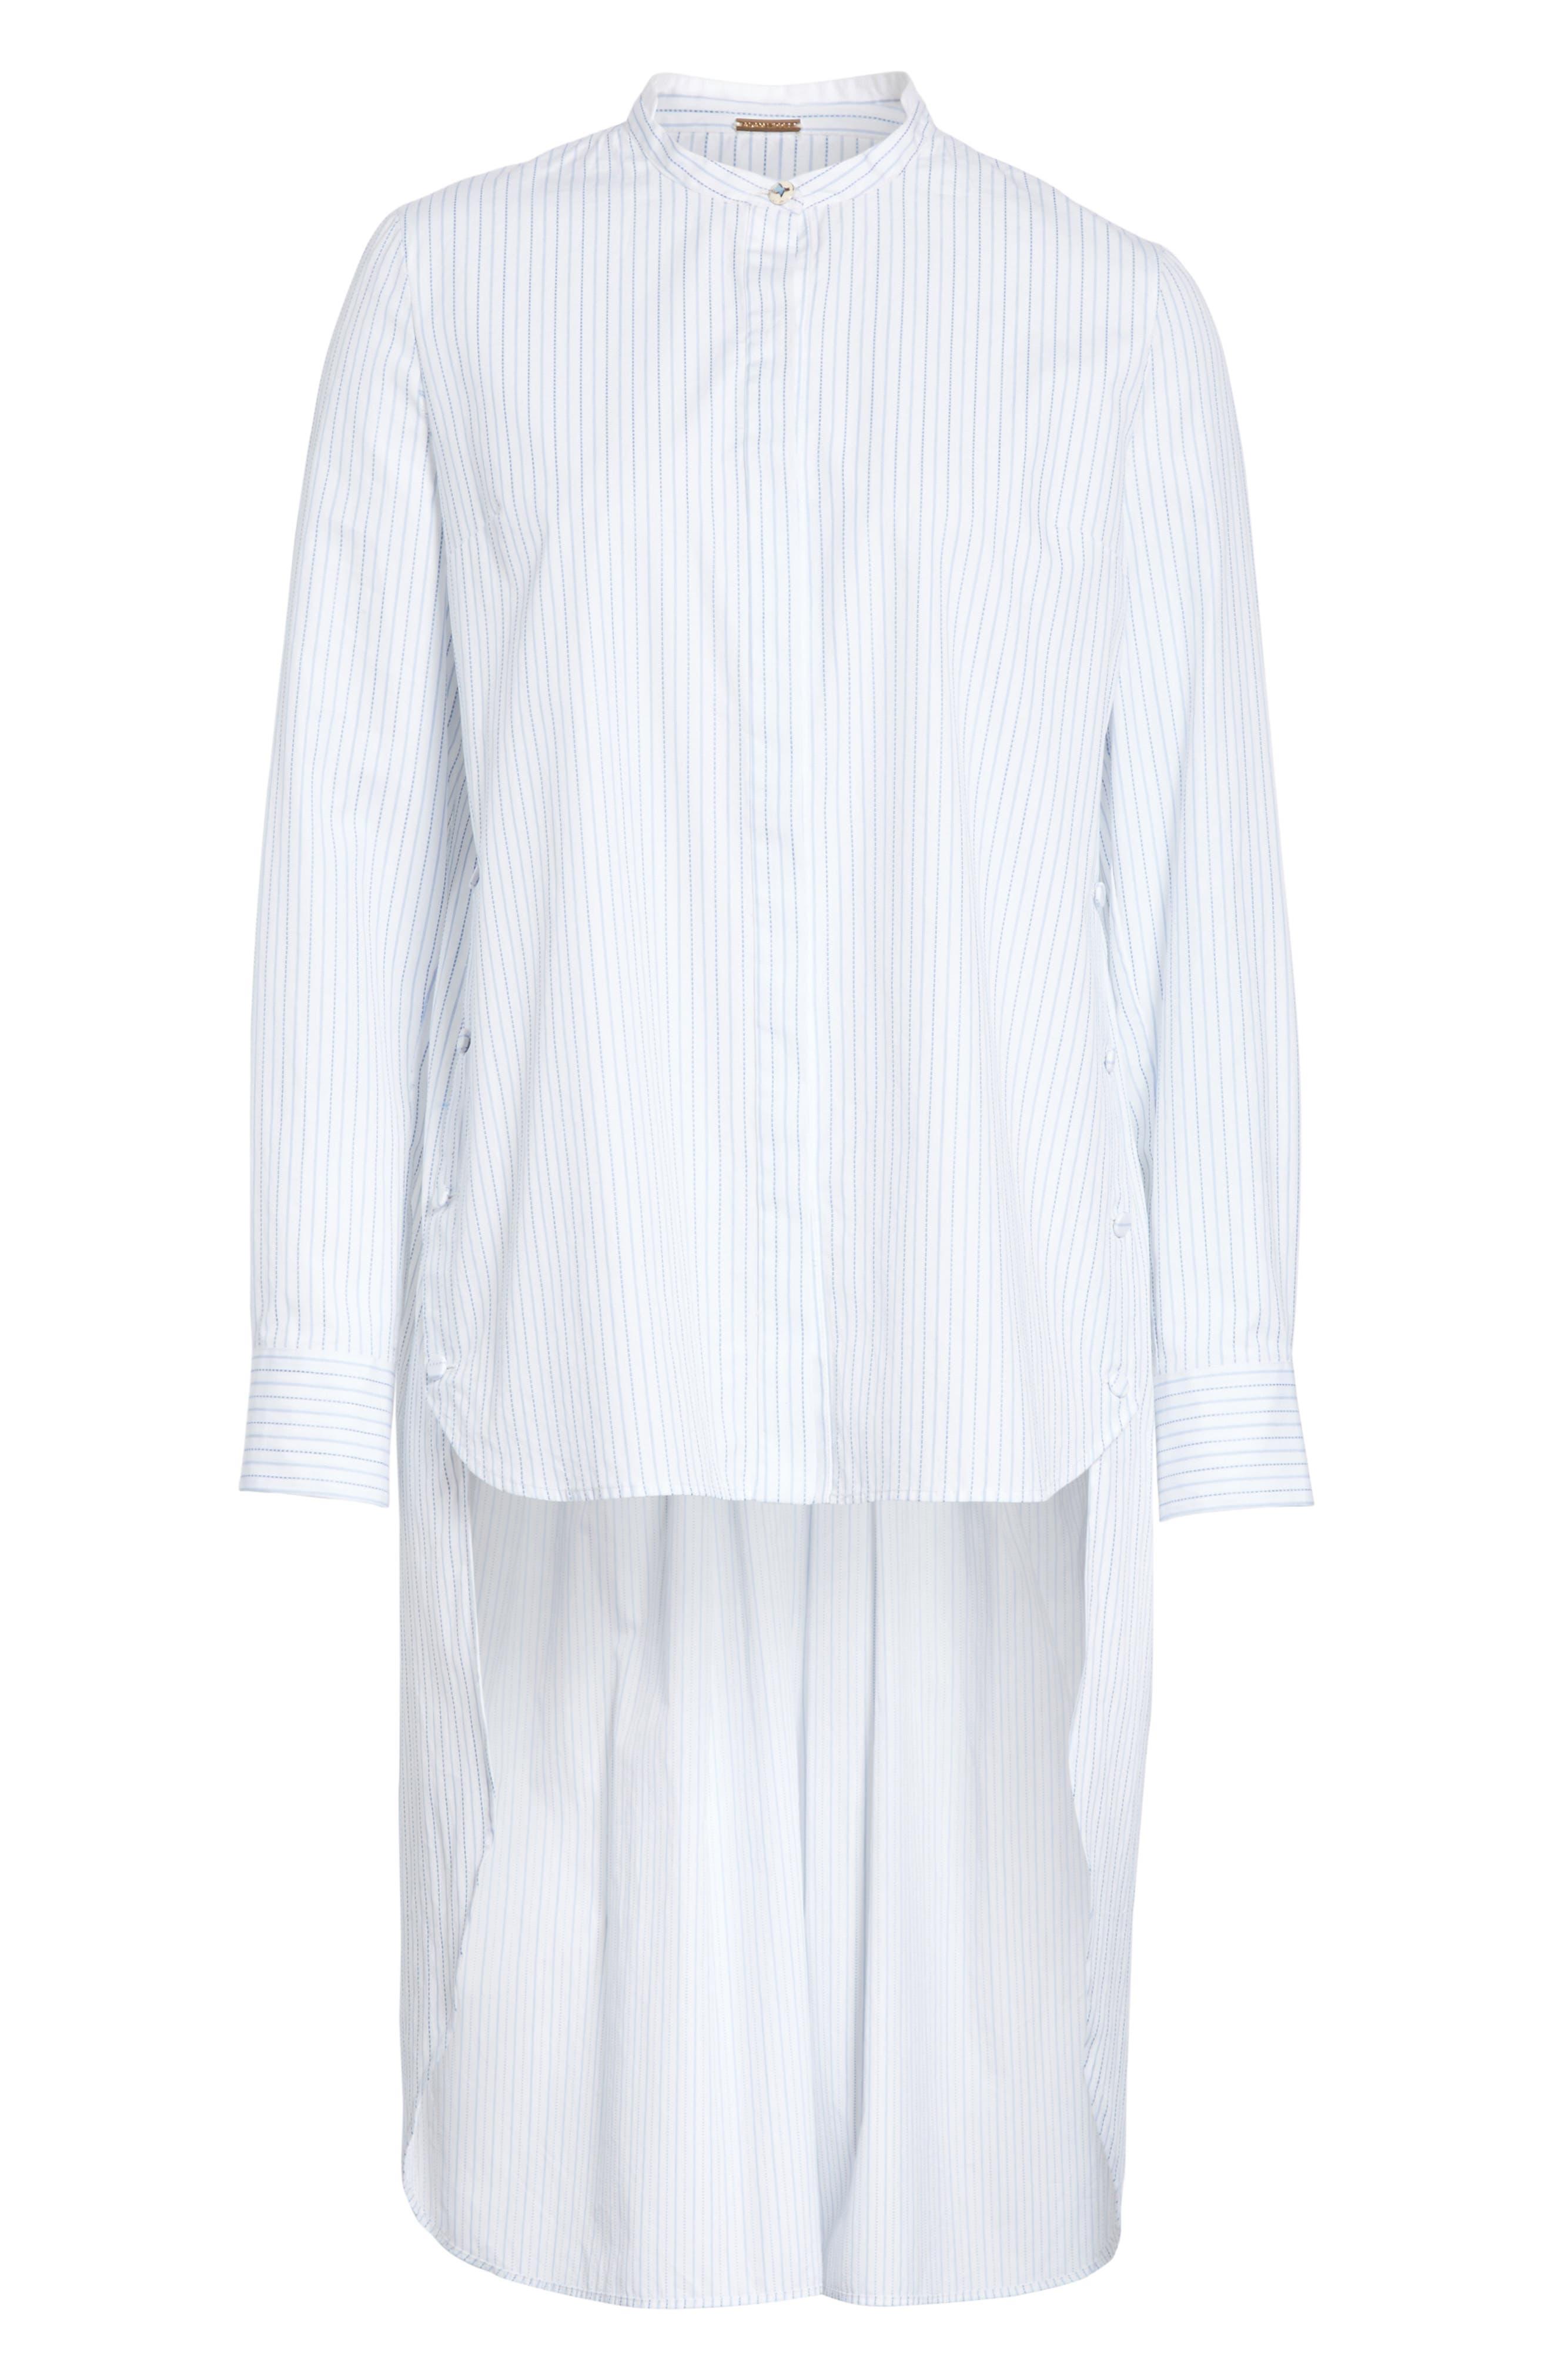 High/Low Stripe Cotton Poplin Shirt,                             Alternate thumbnail 6, color,                             110